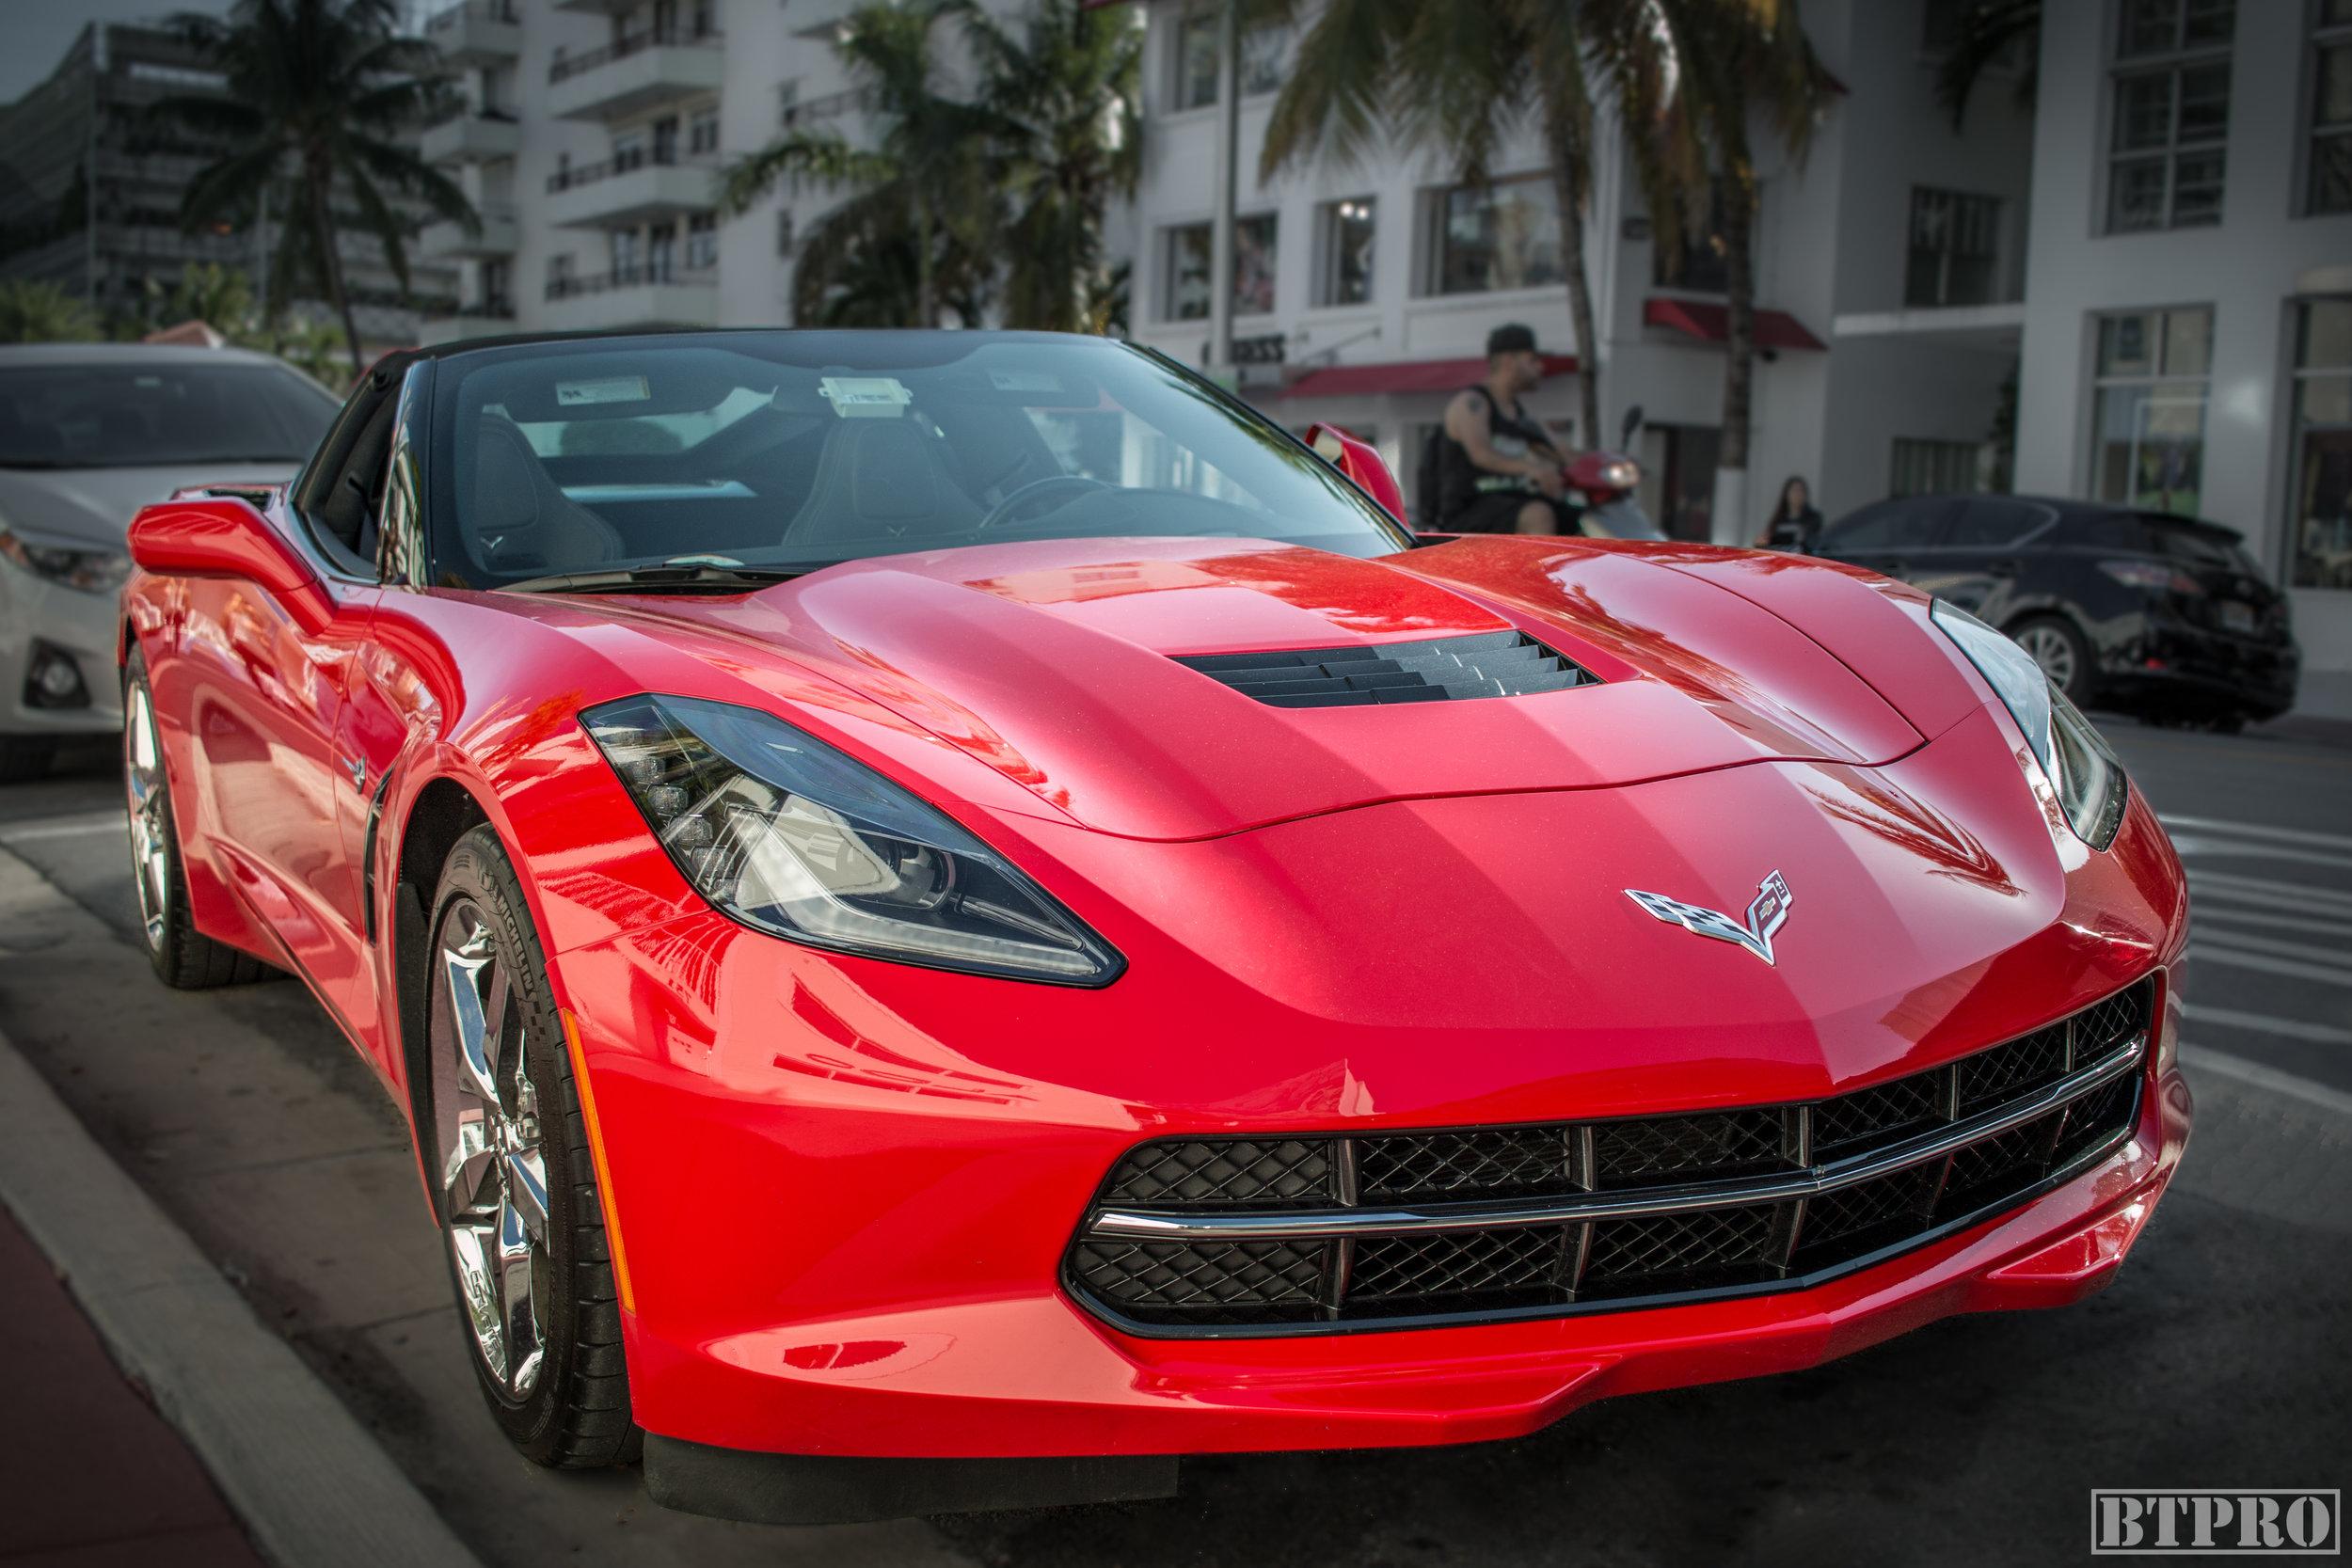 Corvette WEB